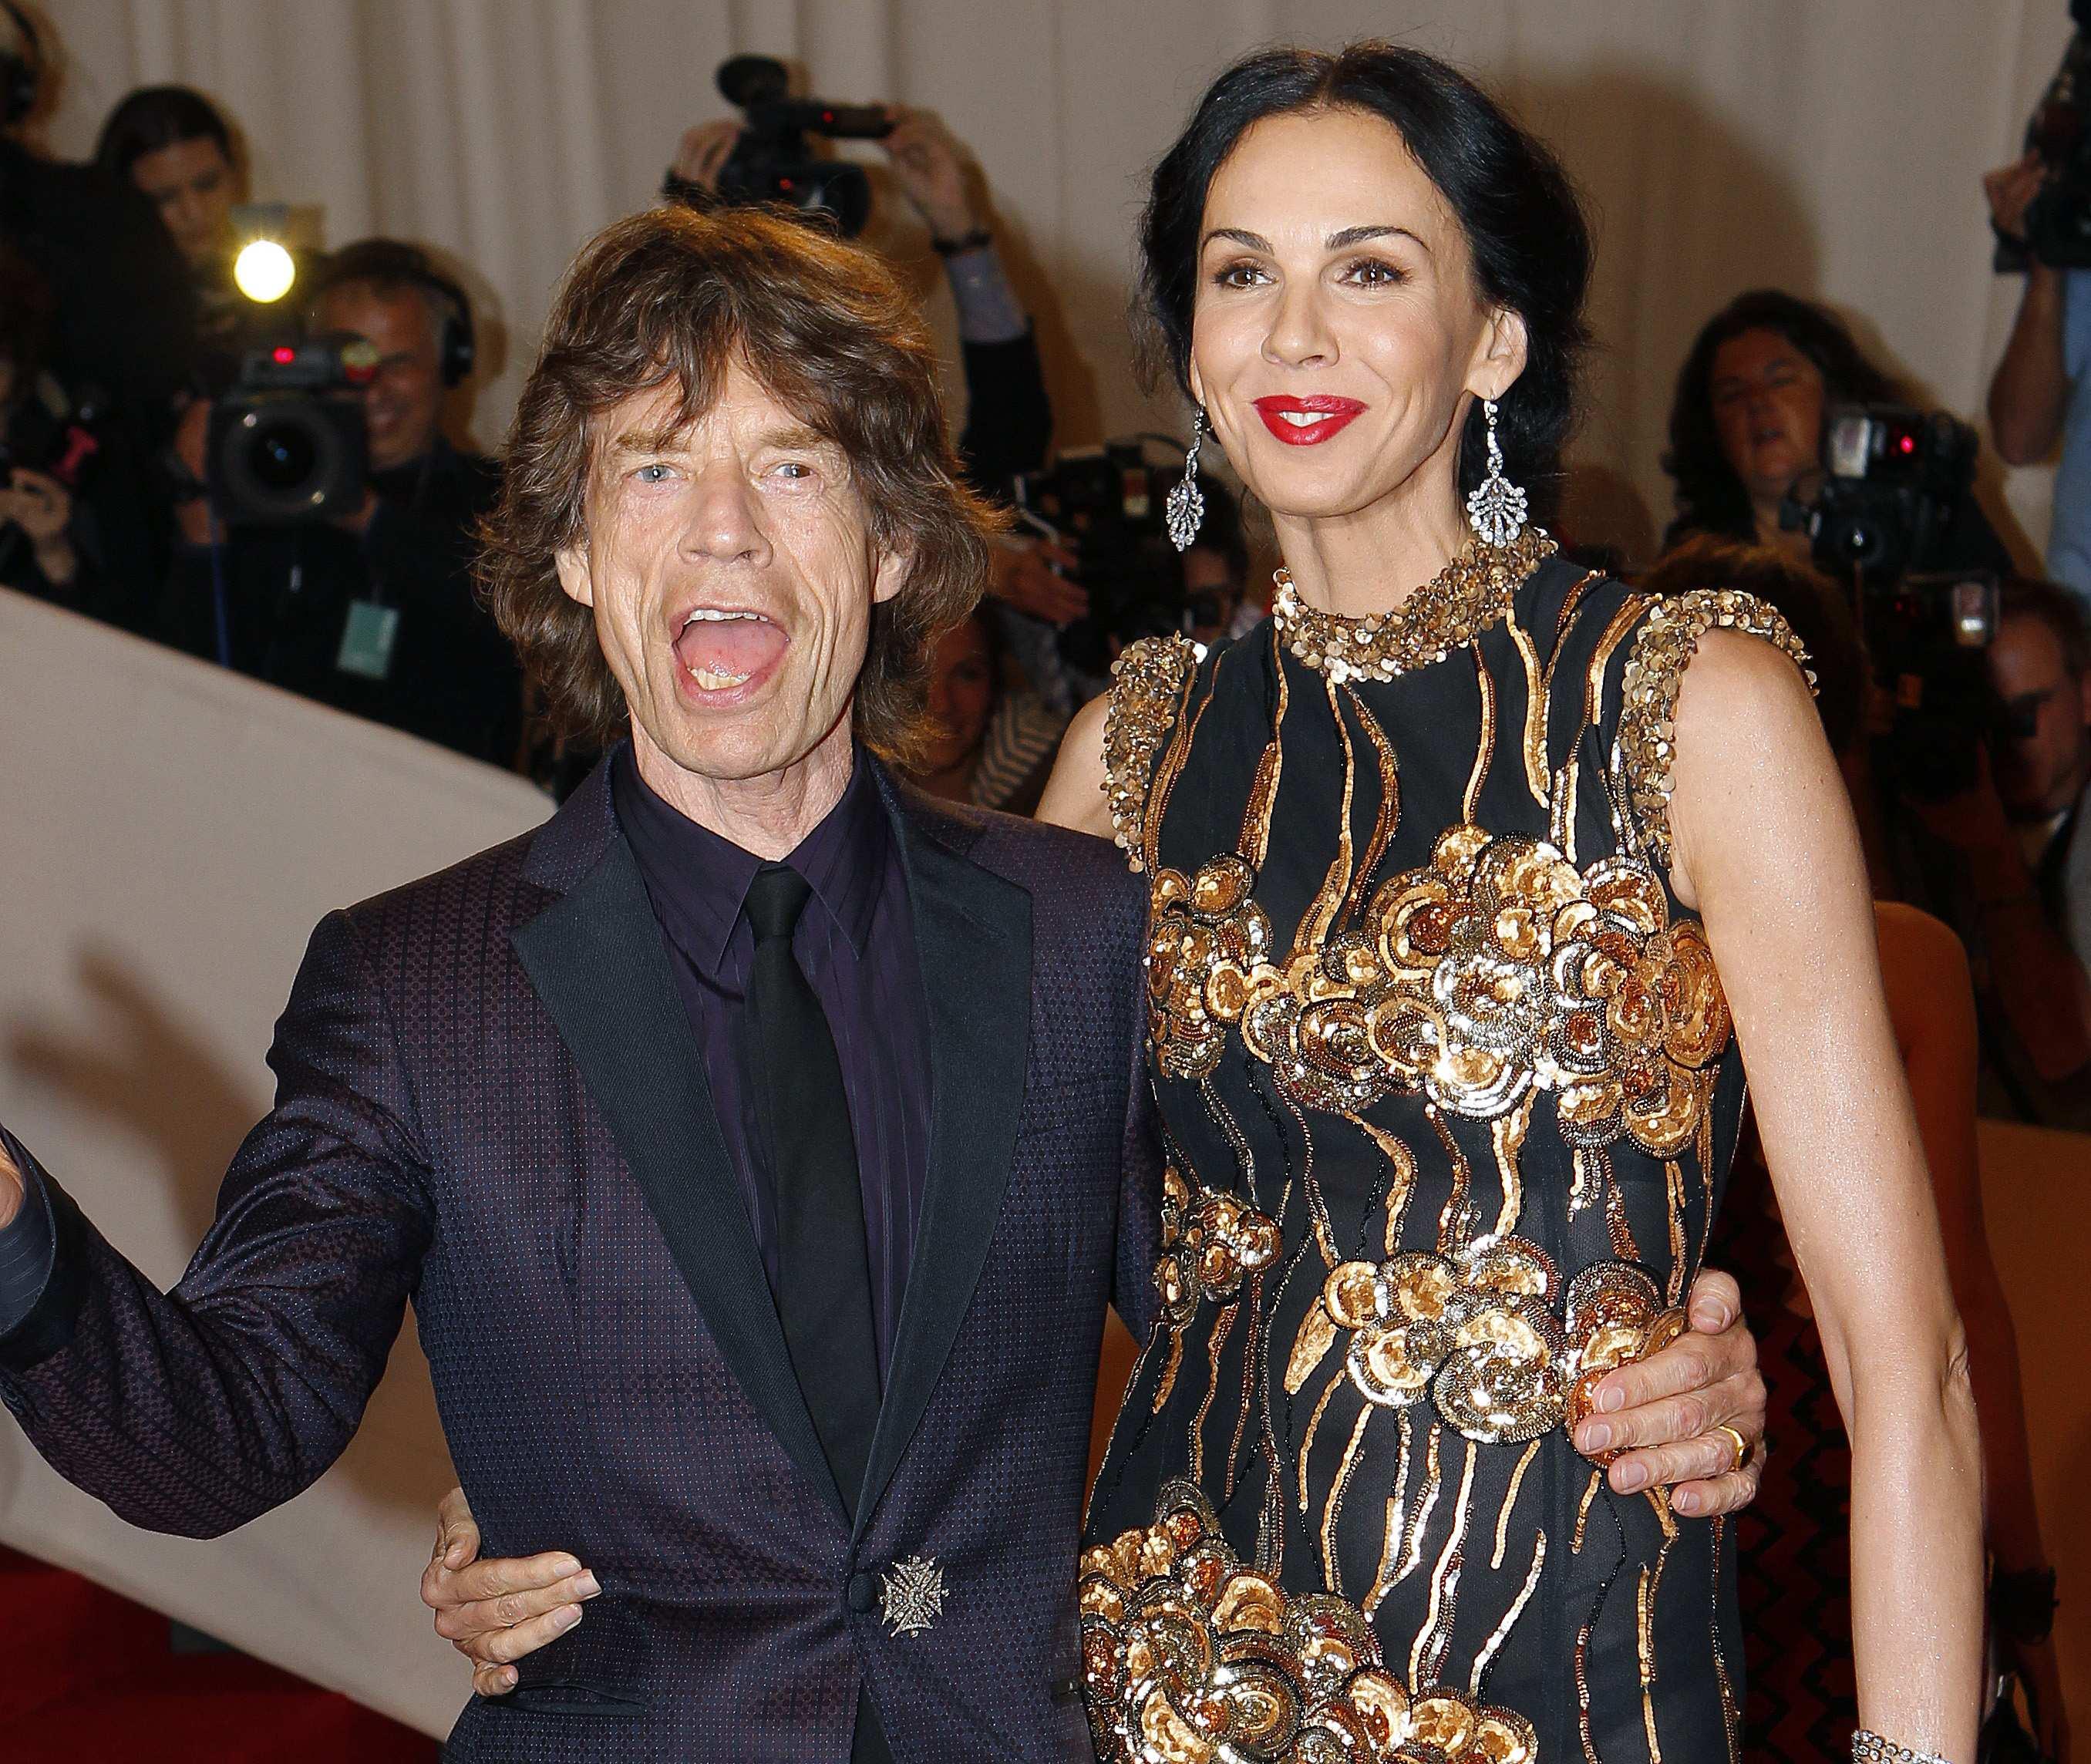 Foto de arquivo registra Mick Jagger e a namorada dele, a designer L